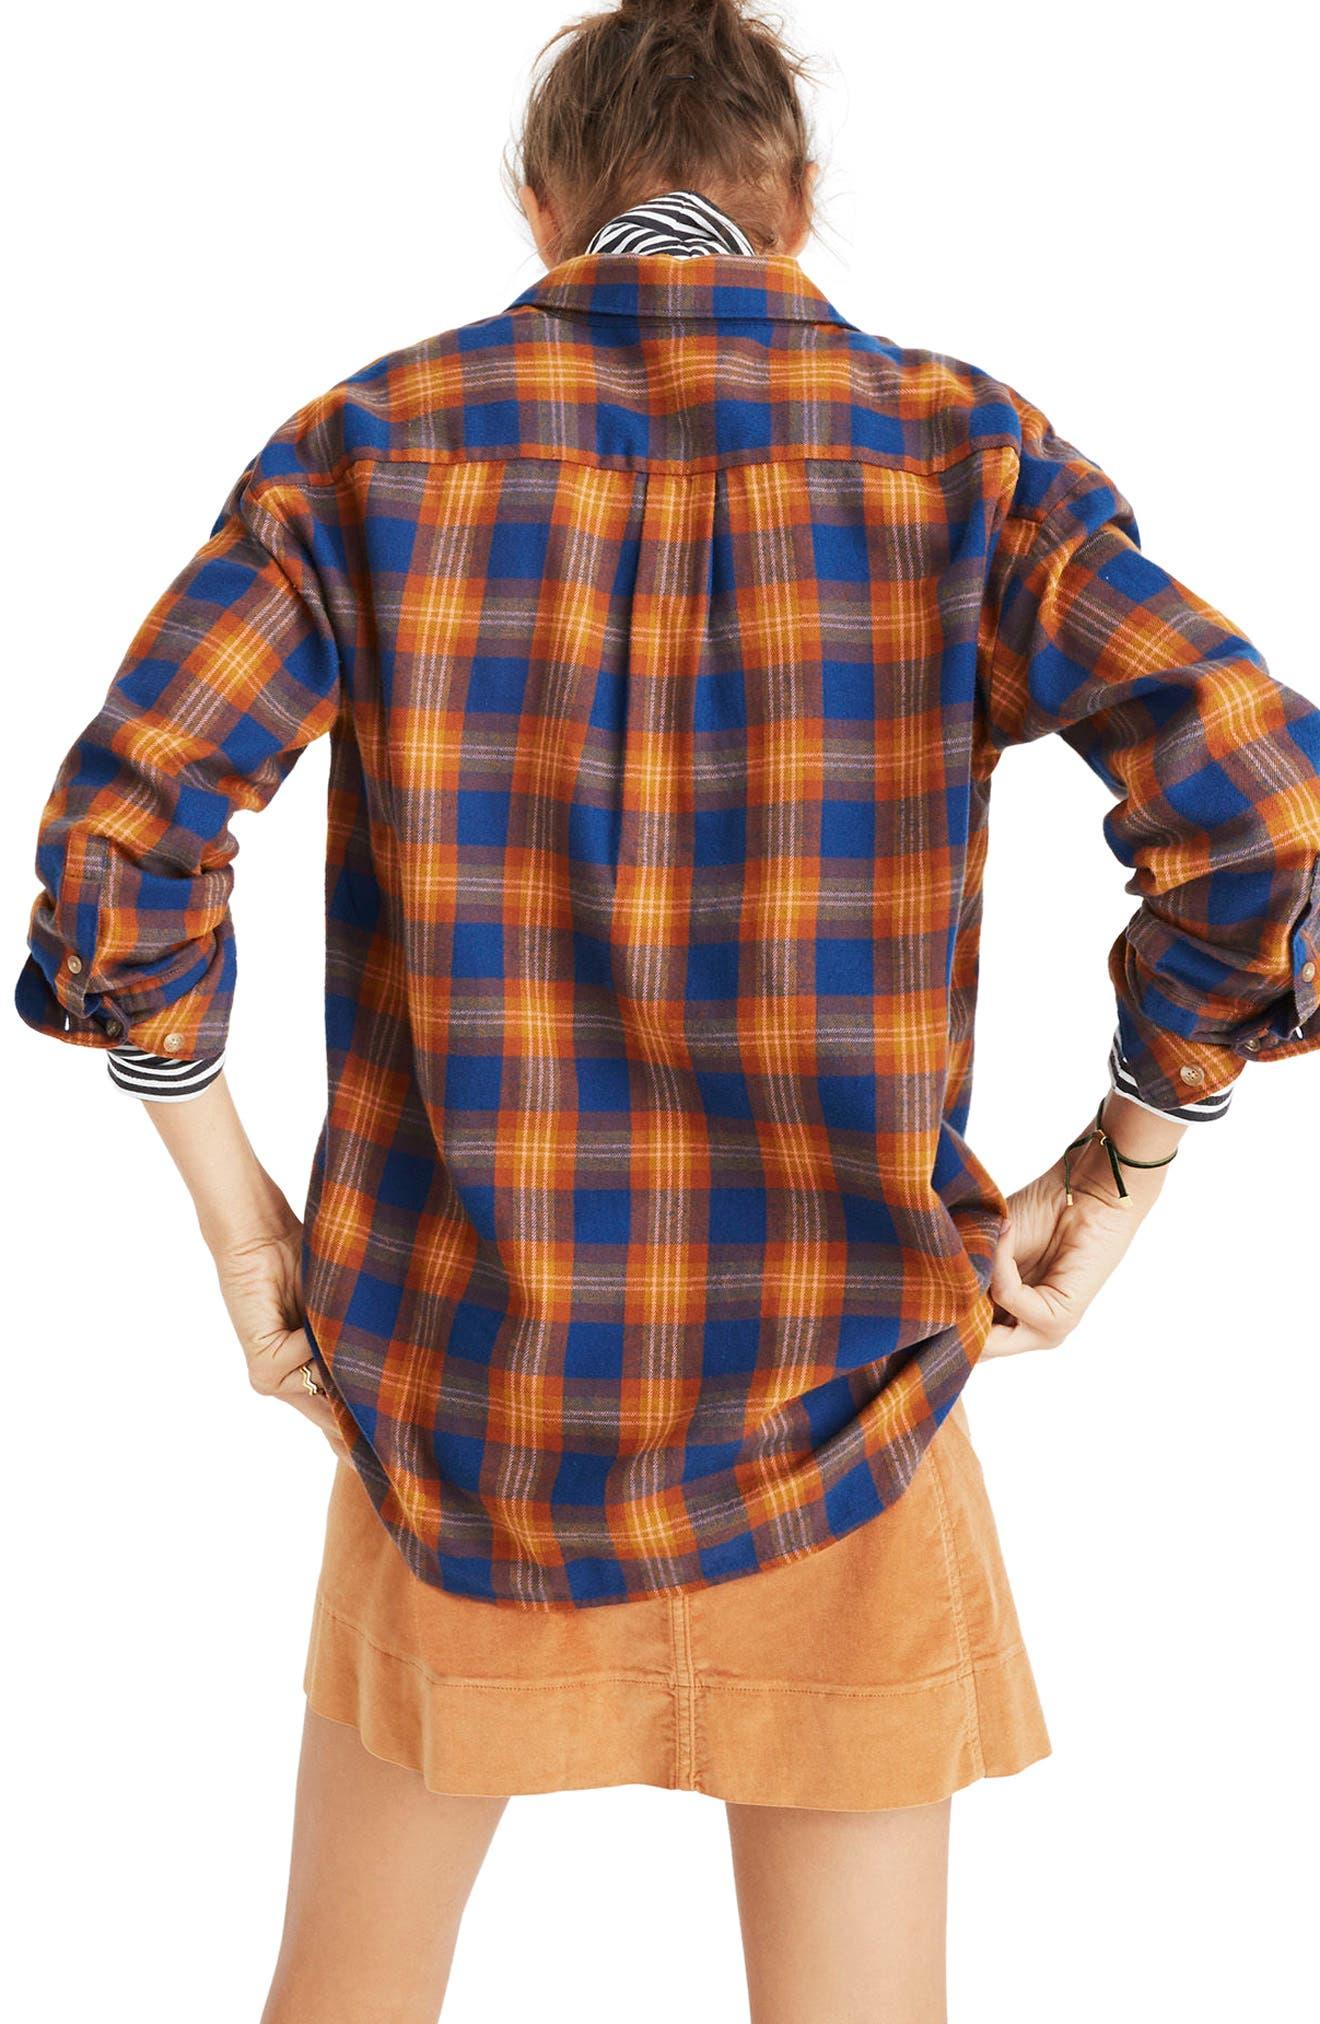 Westward Ardan Plaid Shirt,                             Alternate thumbnail 2, color,                             400